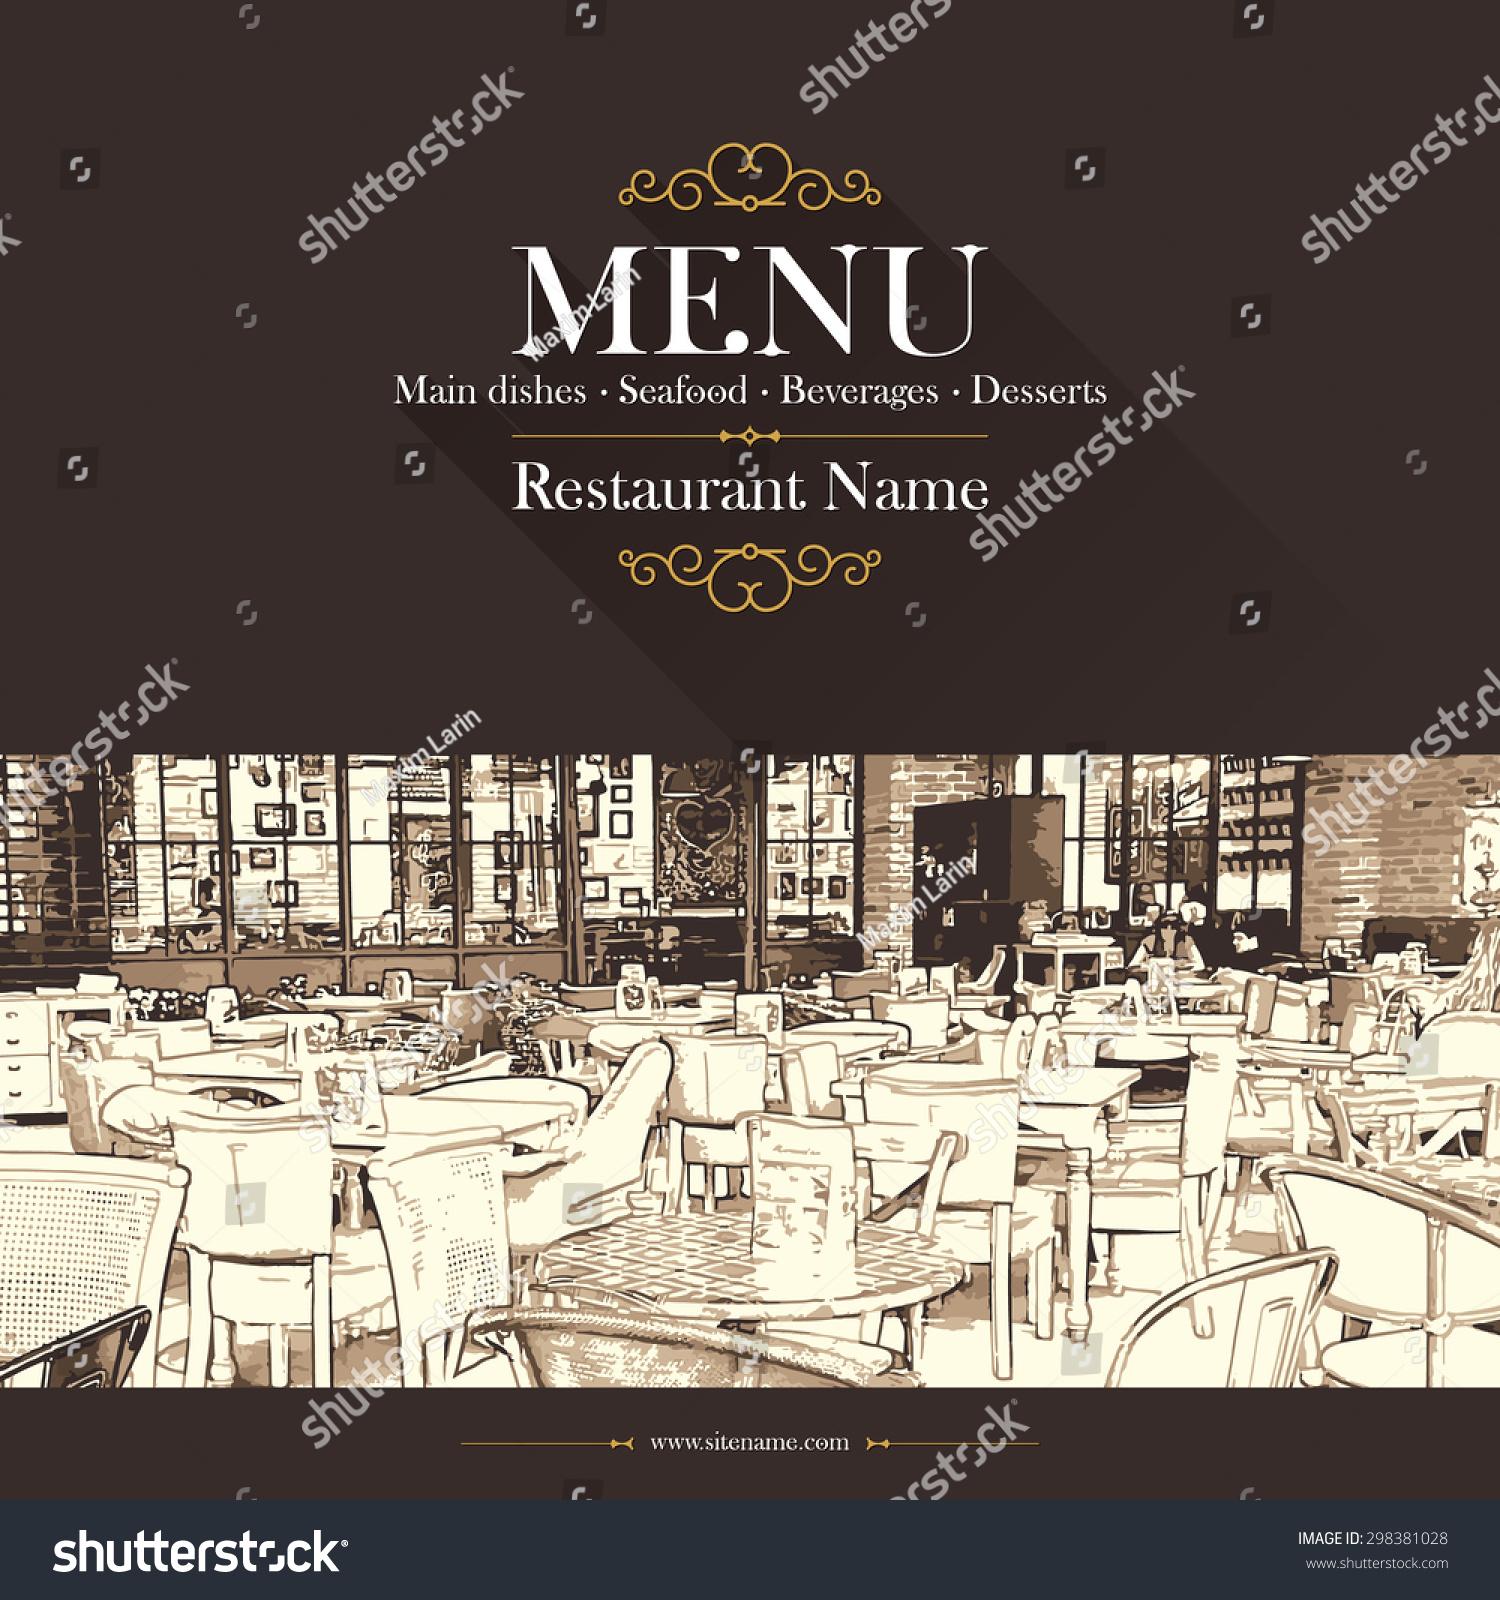 Coffeehouse coffee house restaurant menu stock vector